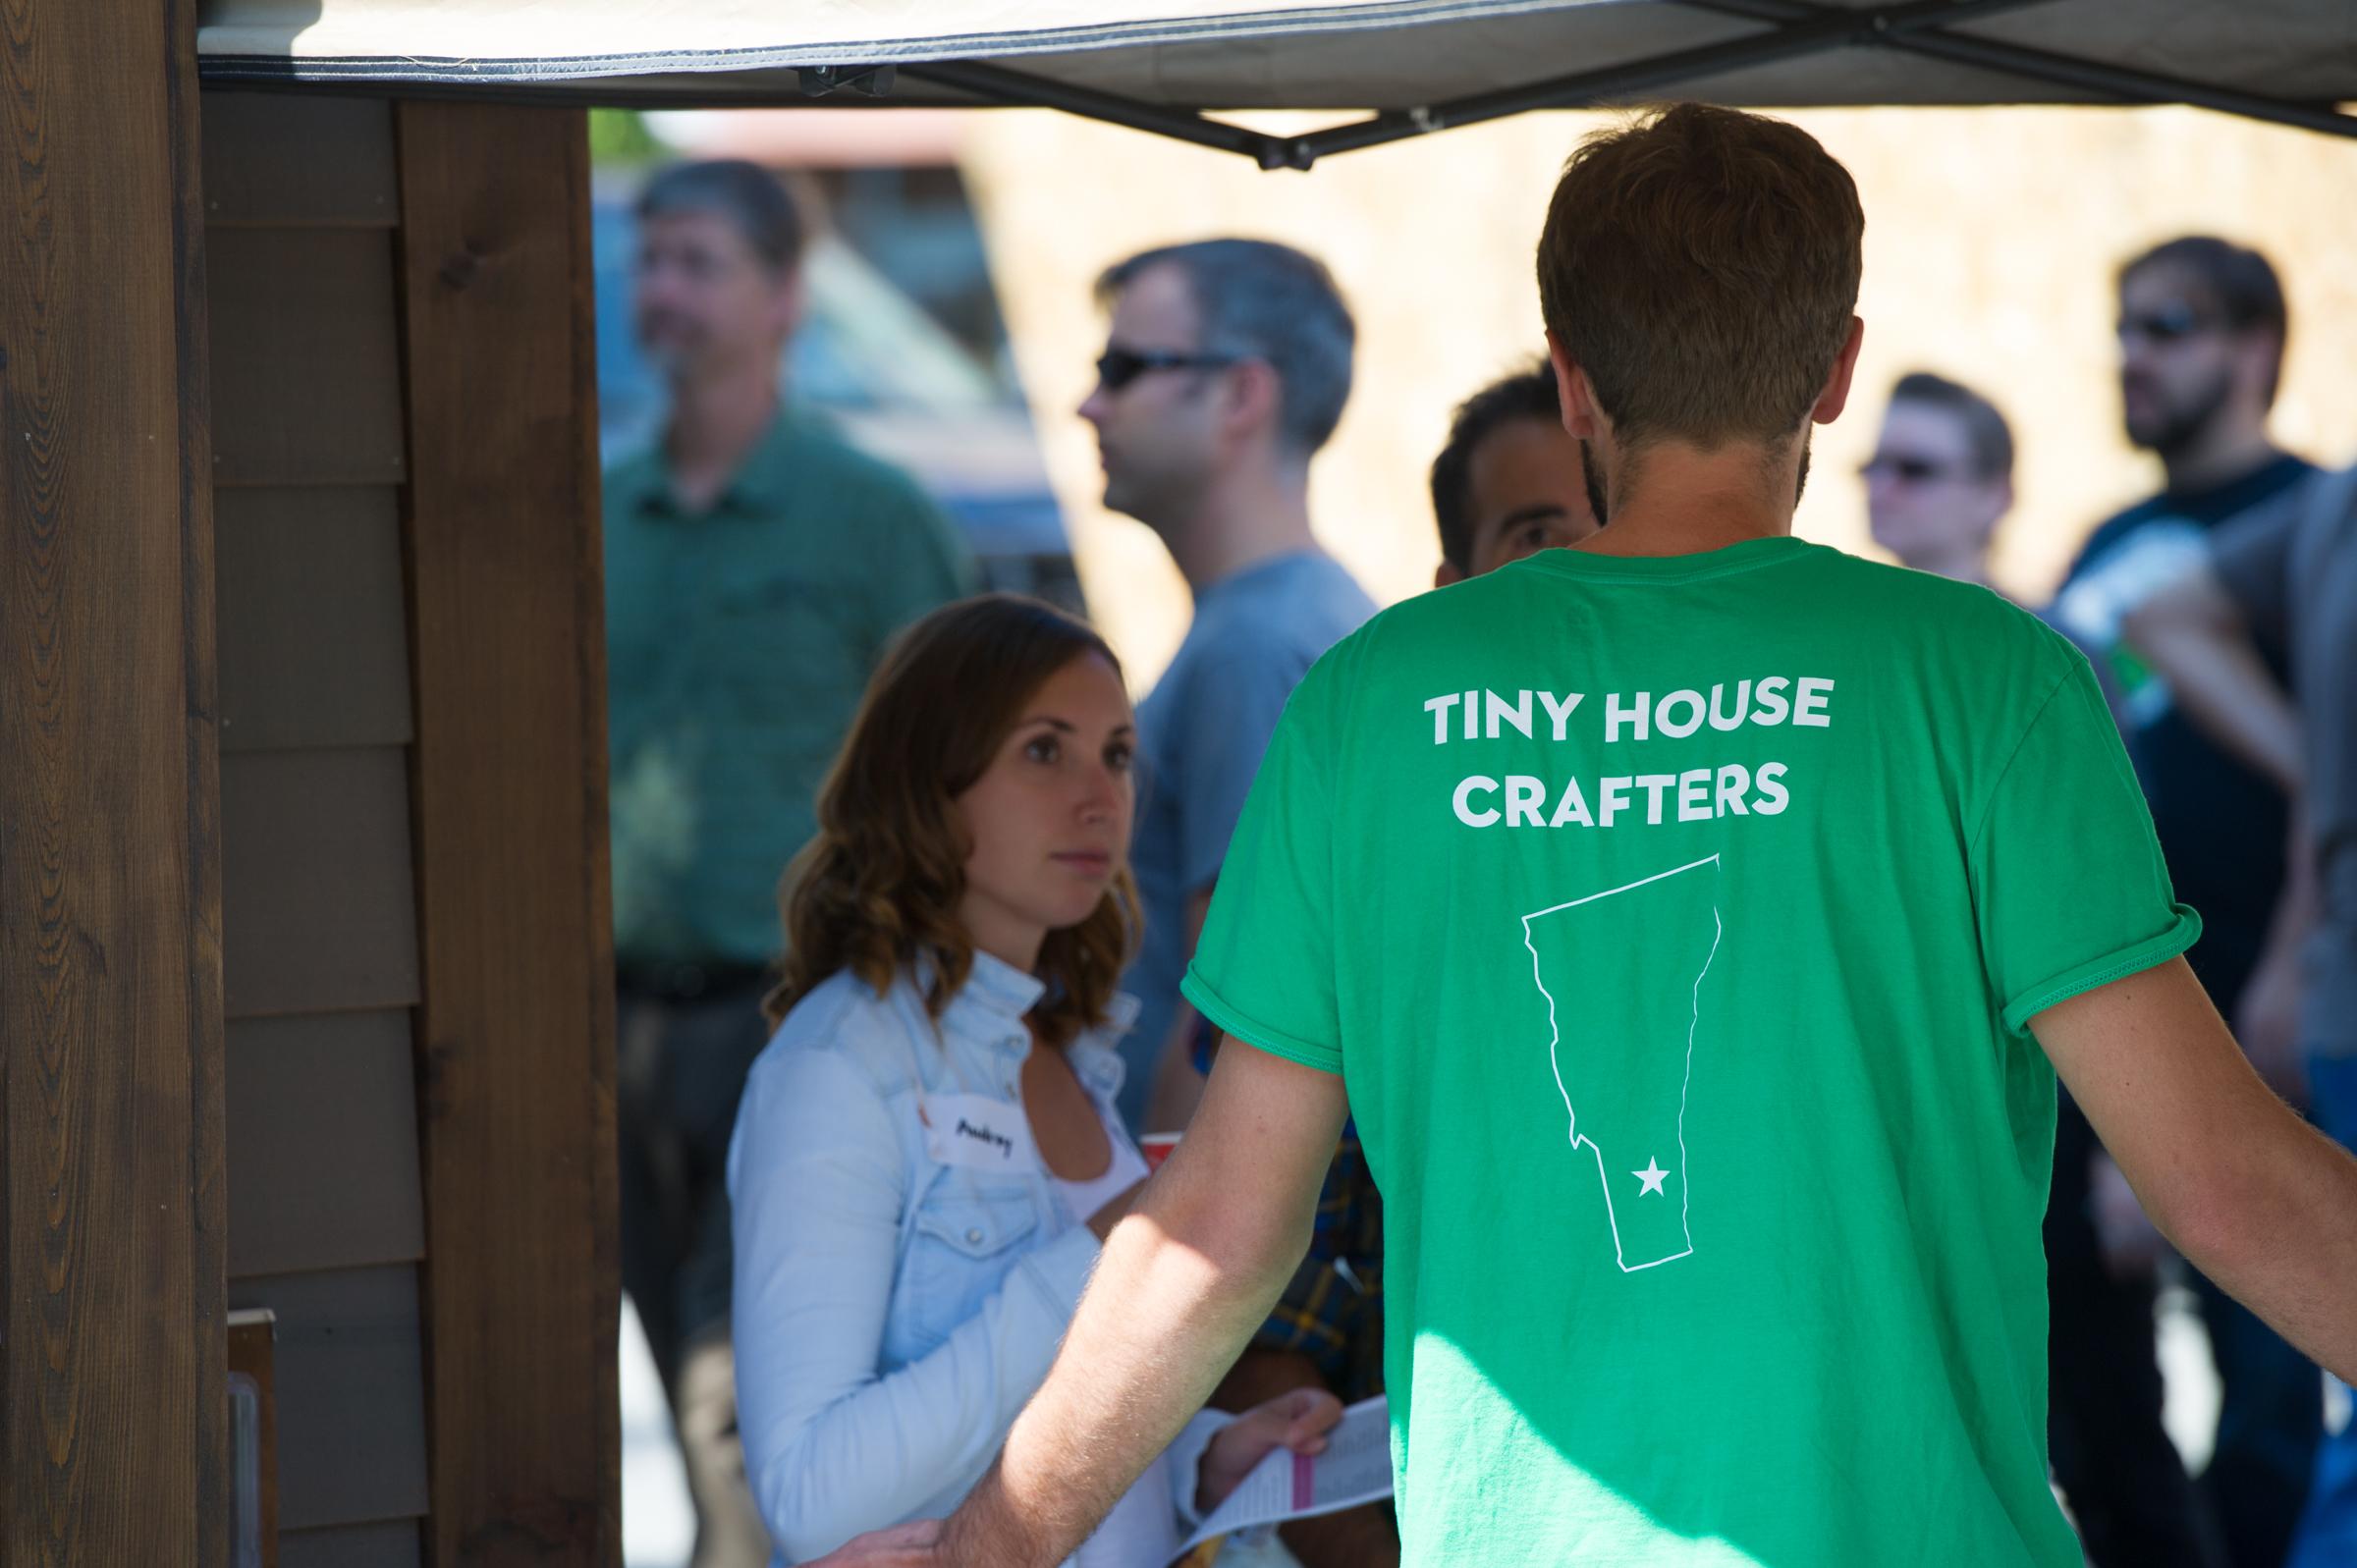 55_TinyHouseCrafters.jpg